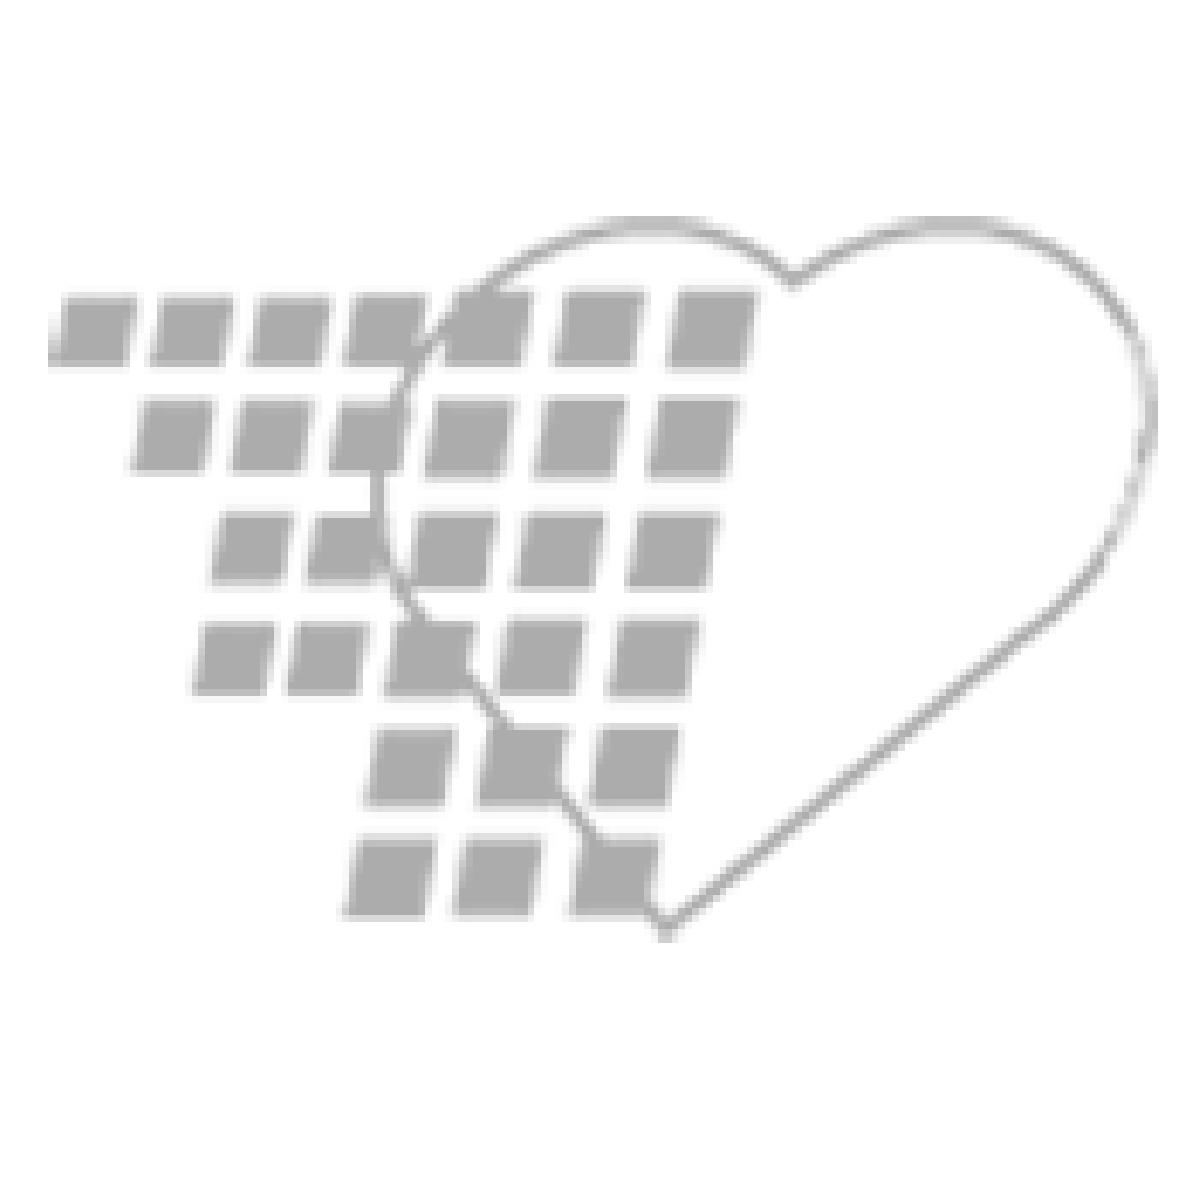 06-93-7529 Demo Dose® Penicilln Powder IV/Kit